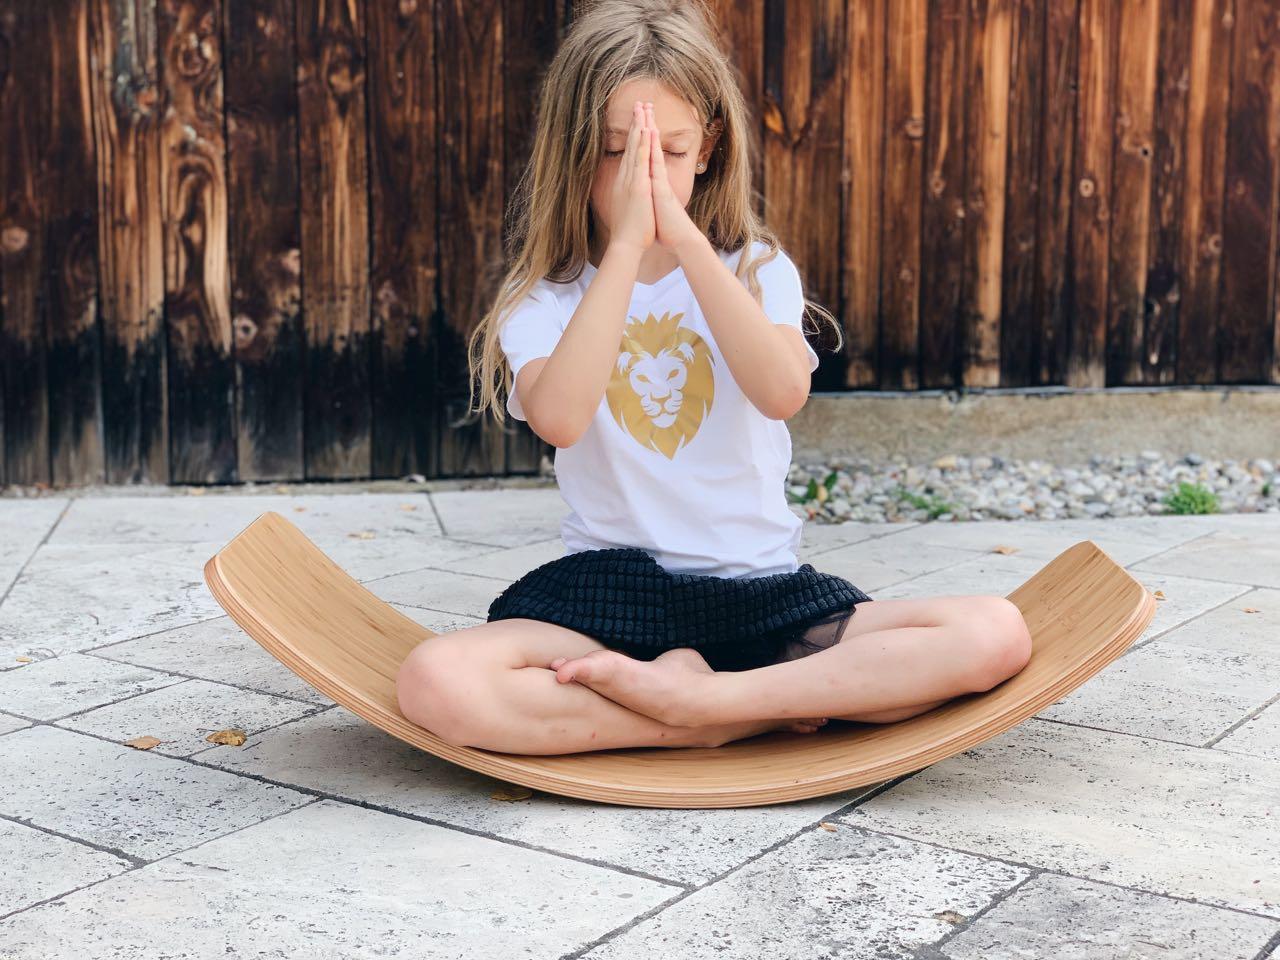 Meditation am Wobble board